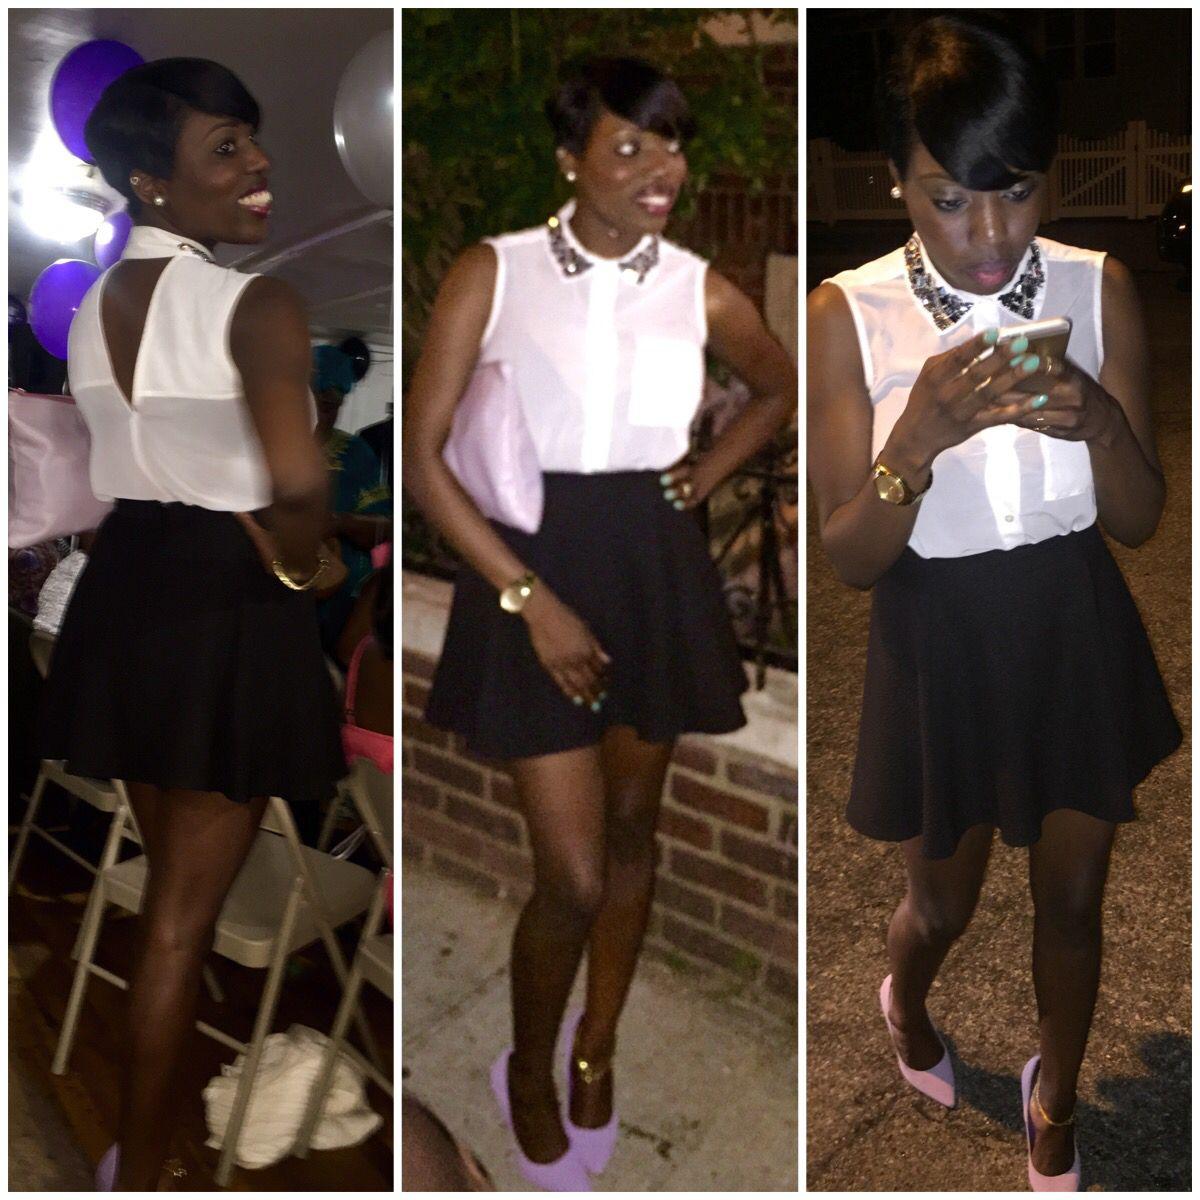 Graduation Party!!! #graduationparty #fashion #summer #blackskirt #whiteshirt #purplepumps #purplebag #cute #smile #iphoneonly #stylish #girl #classy #chic